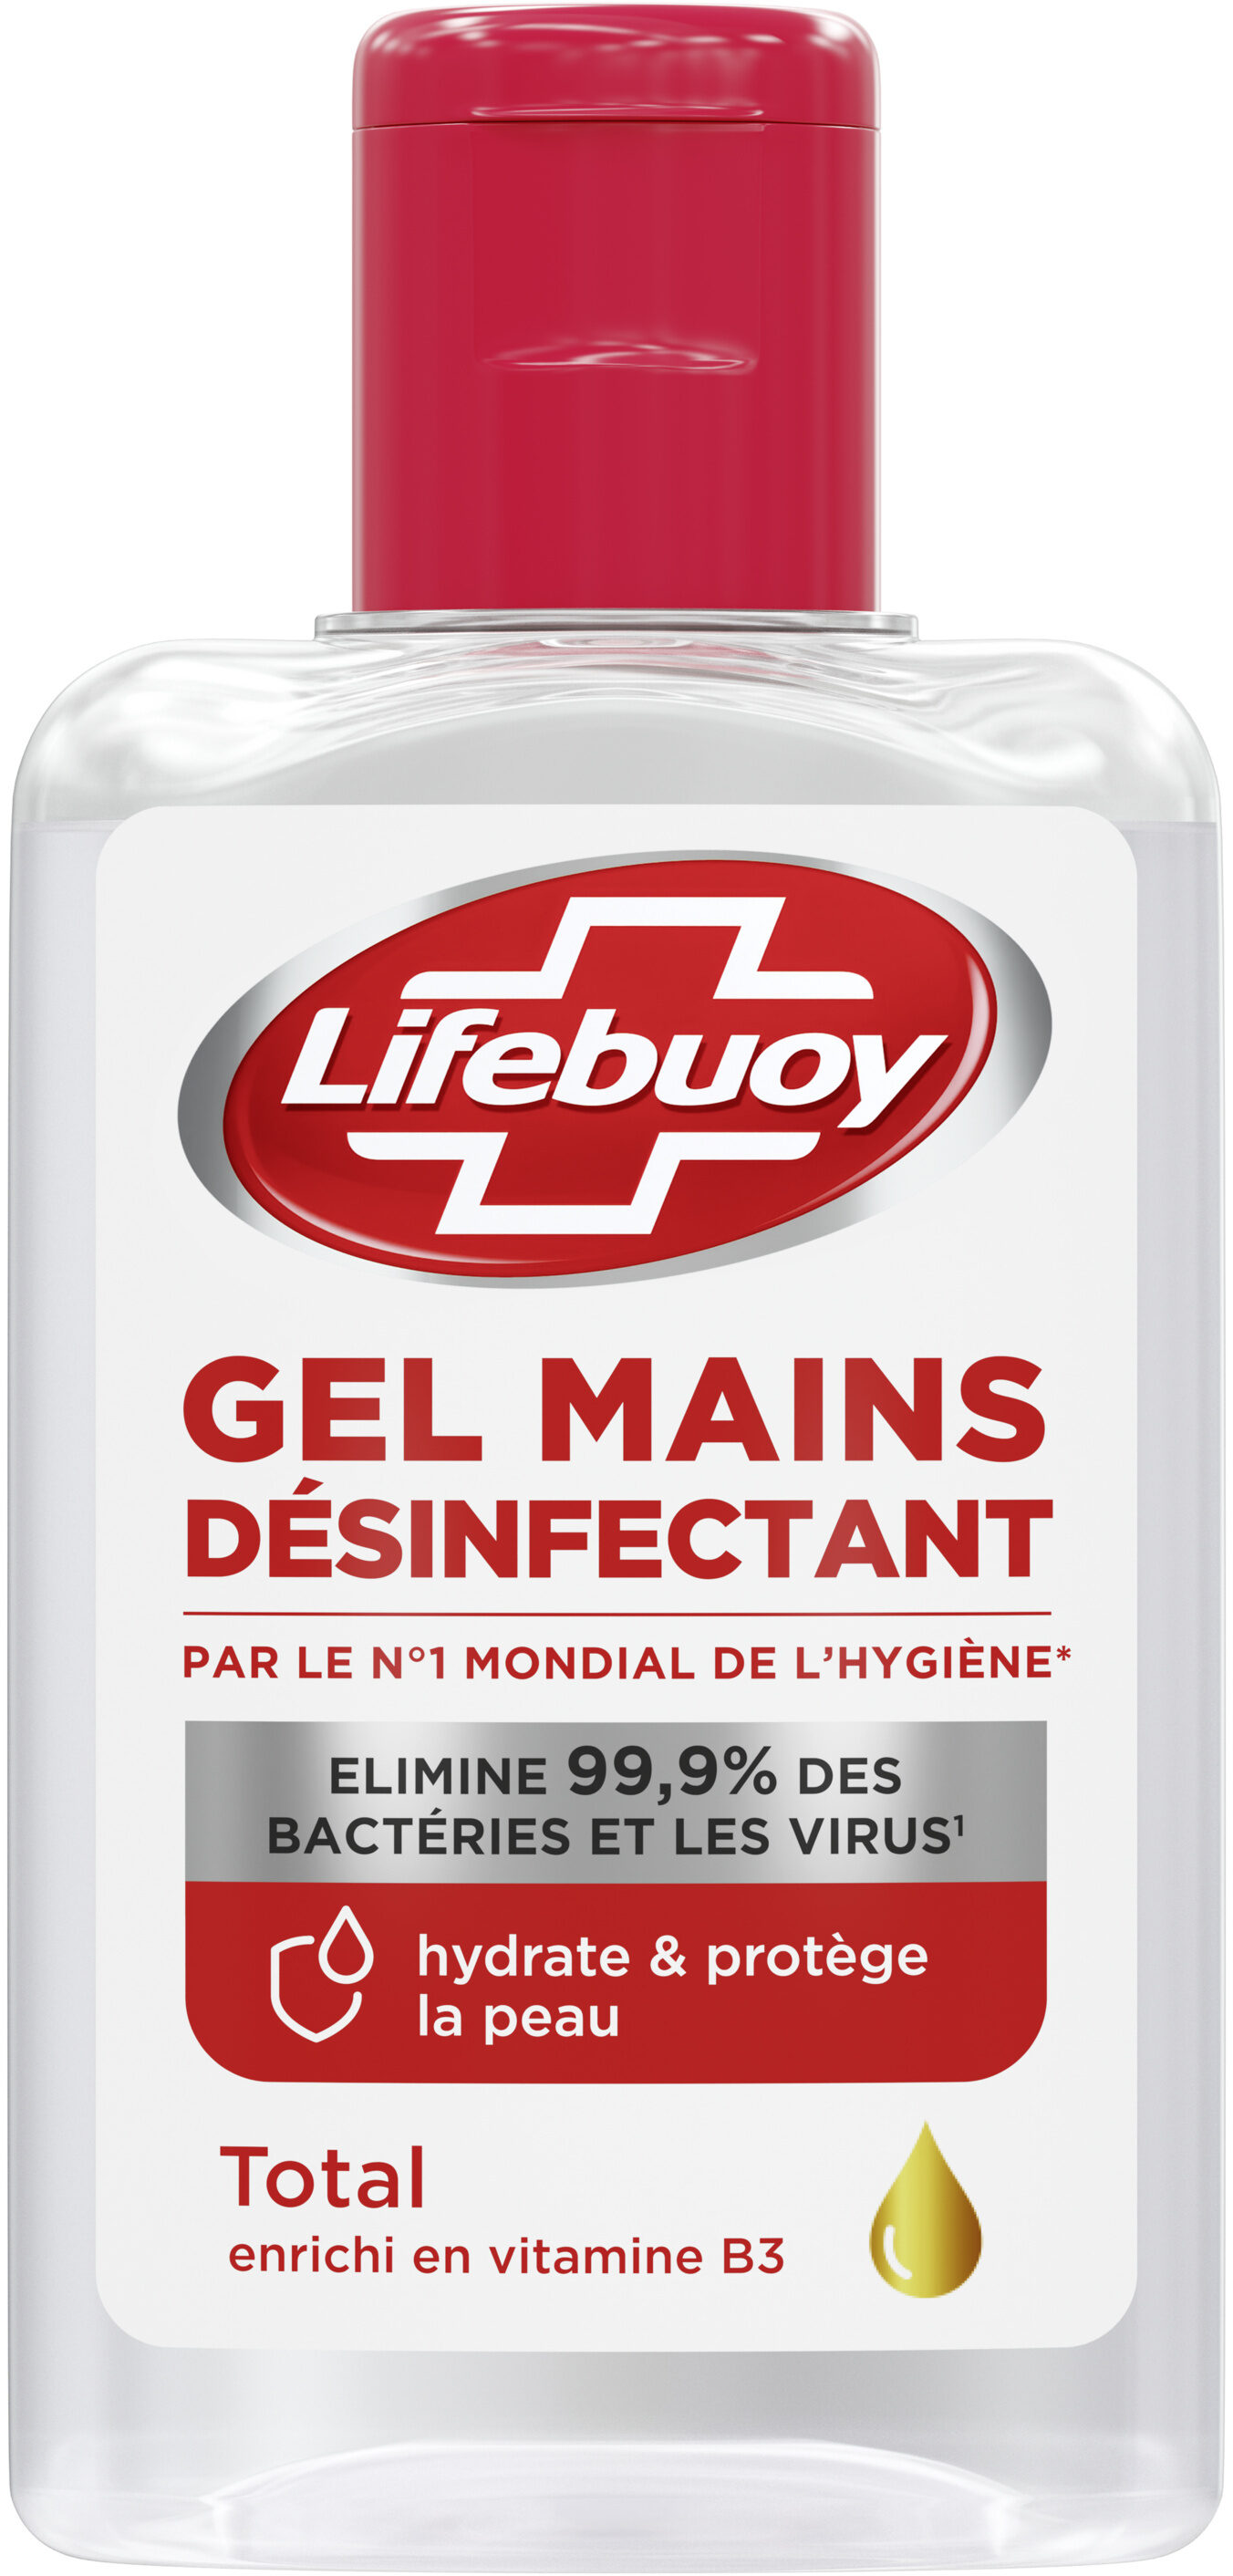 Lifebuoy Gel Hydroalcoolique Mains Flacon - Produit - fr